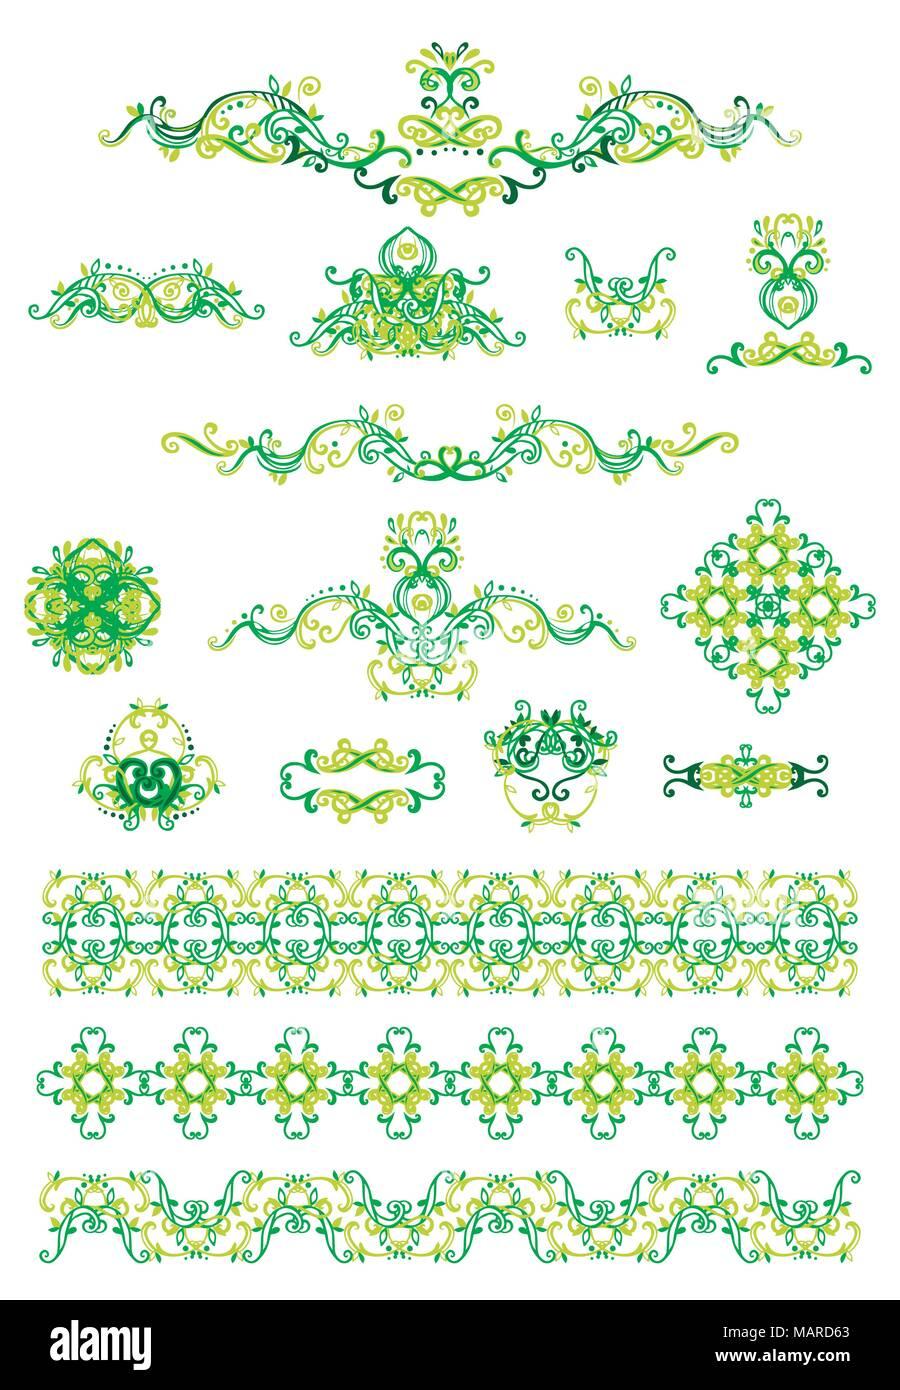 Islamic Vintage Floral Pattern Template Stockfotos & Islamic Vintage ...